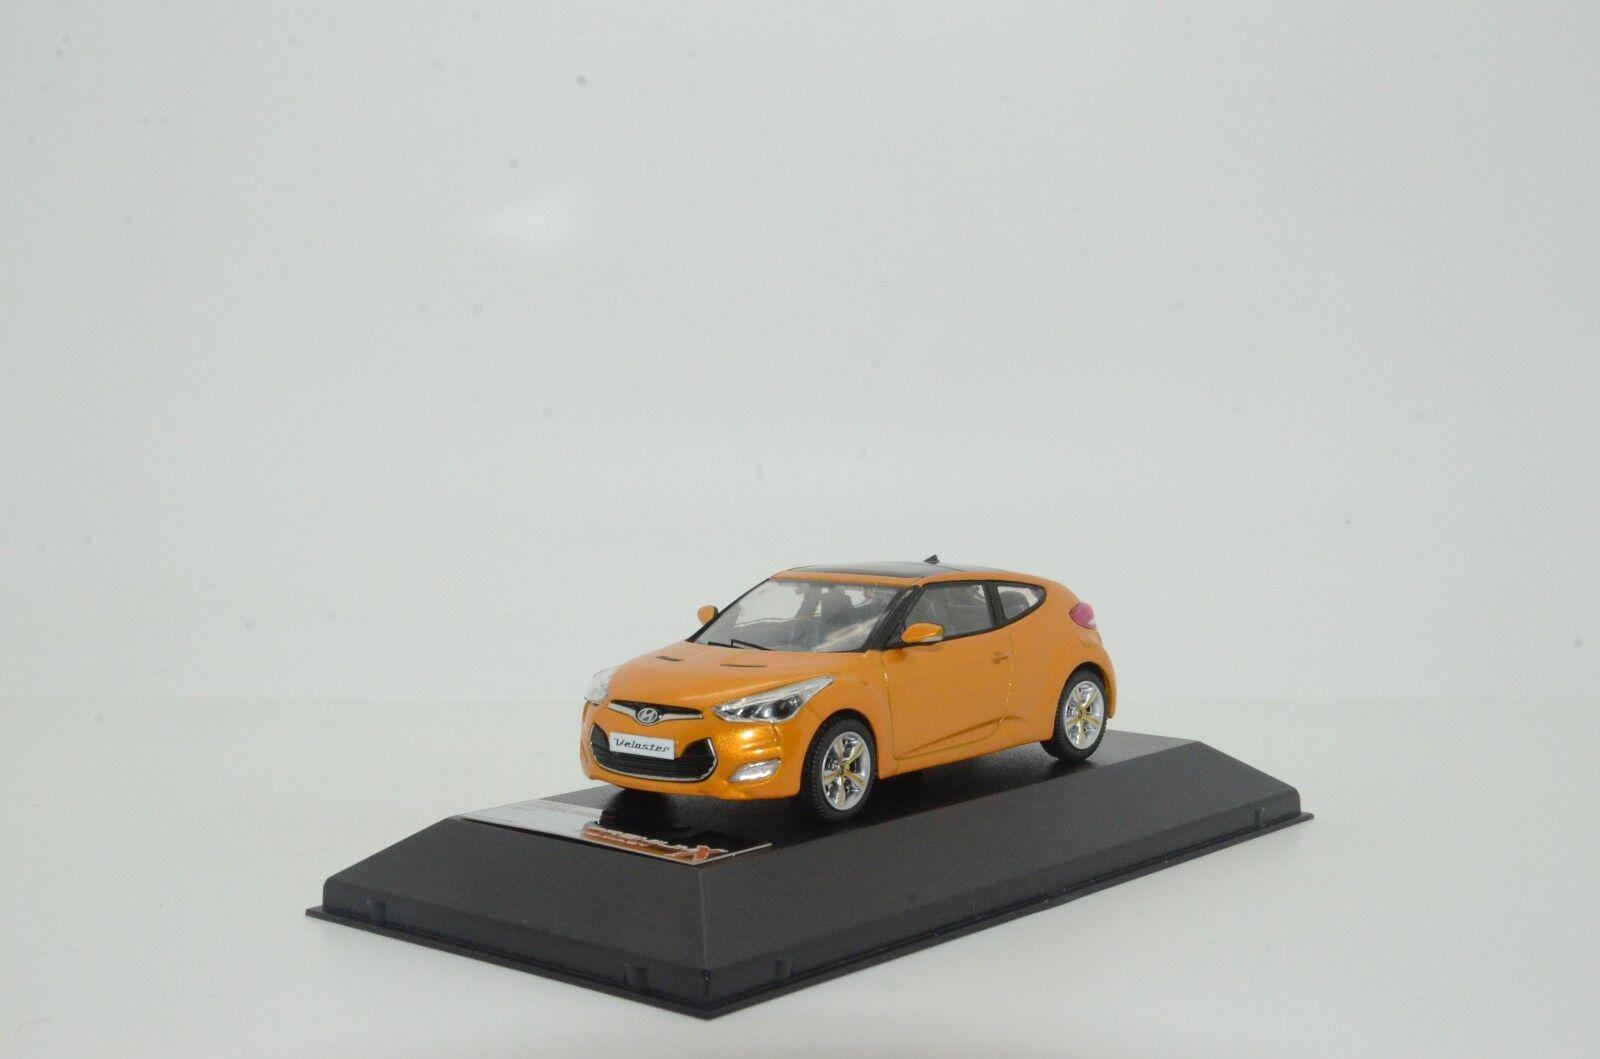 rara Hyundai Veloster 2018 Naranja PremiumX PRD270 1/43